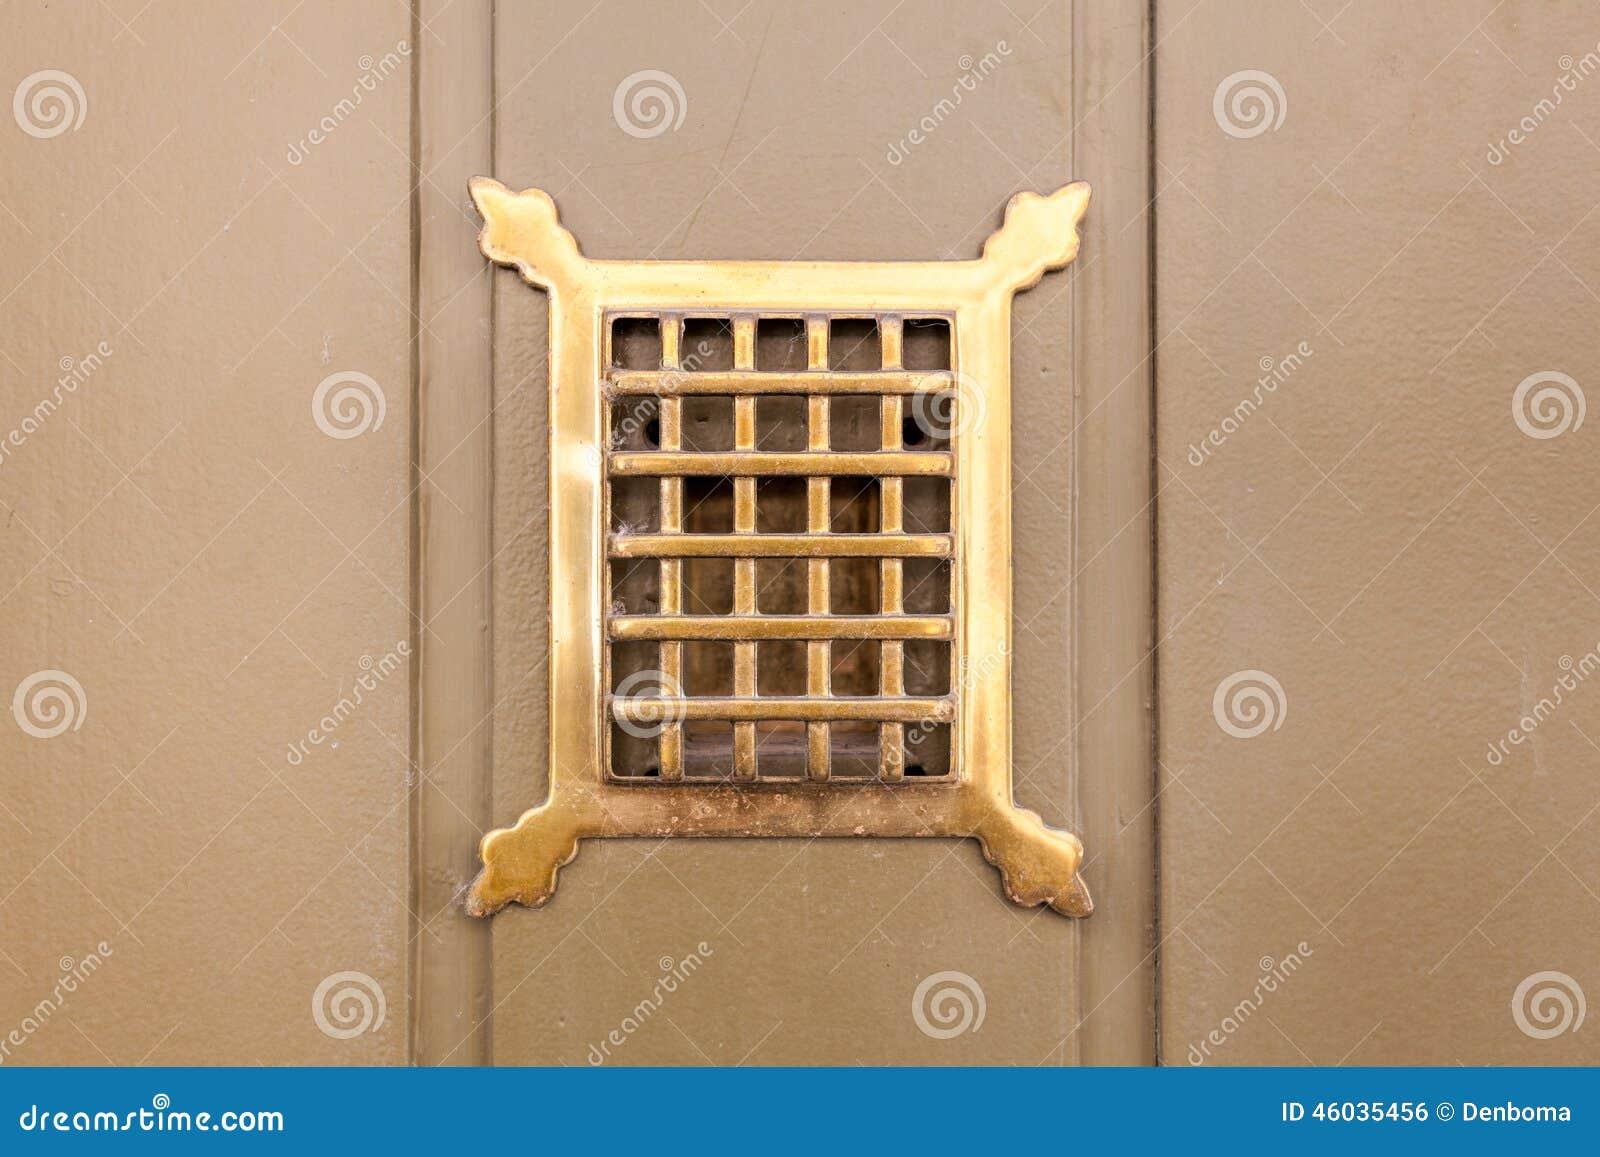 Good Copper Door Frame Hole Peephole See ...